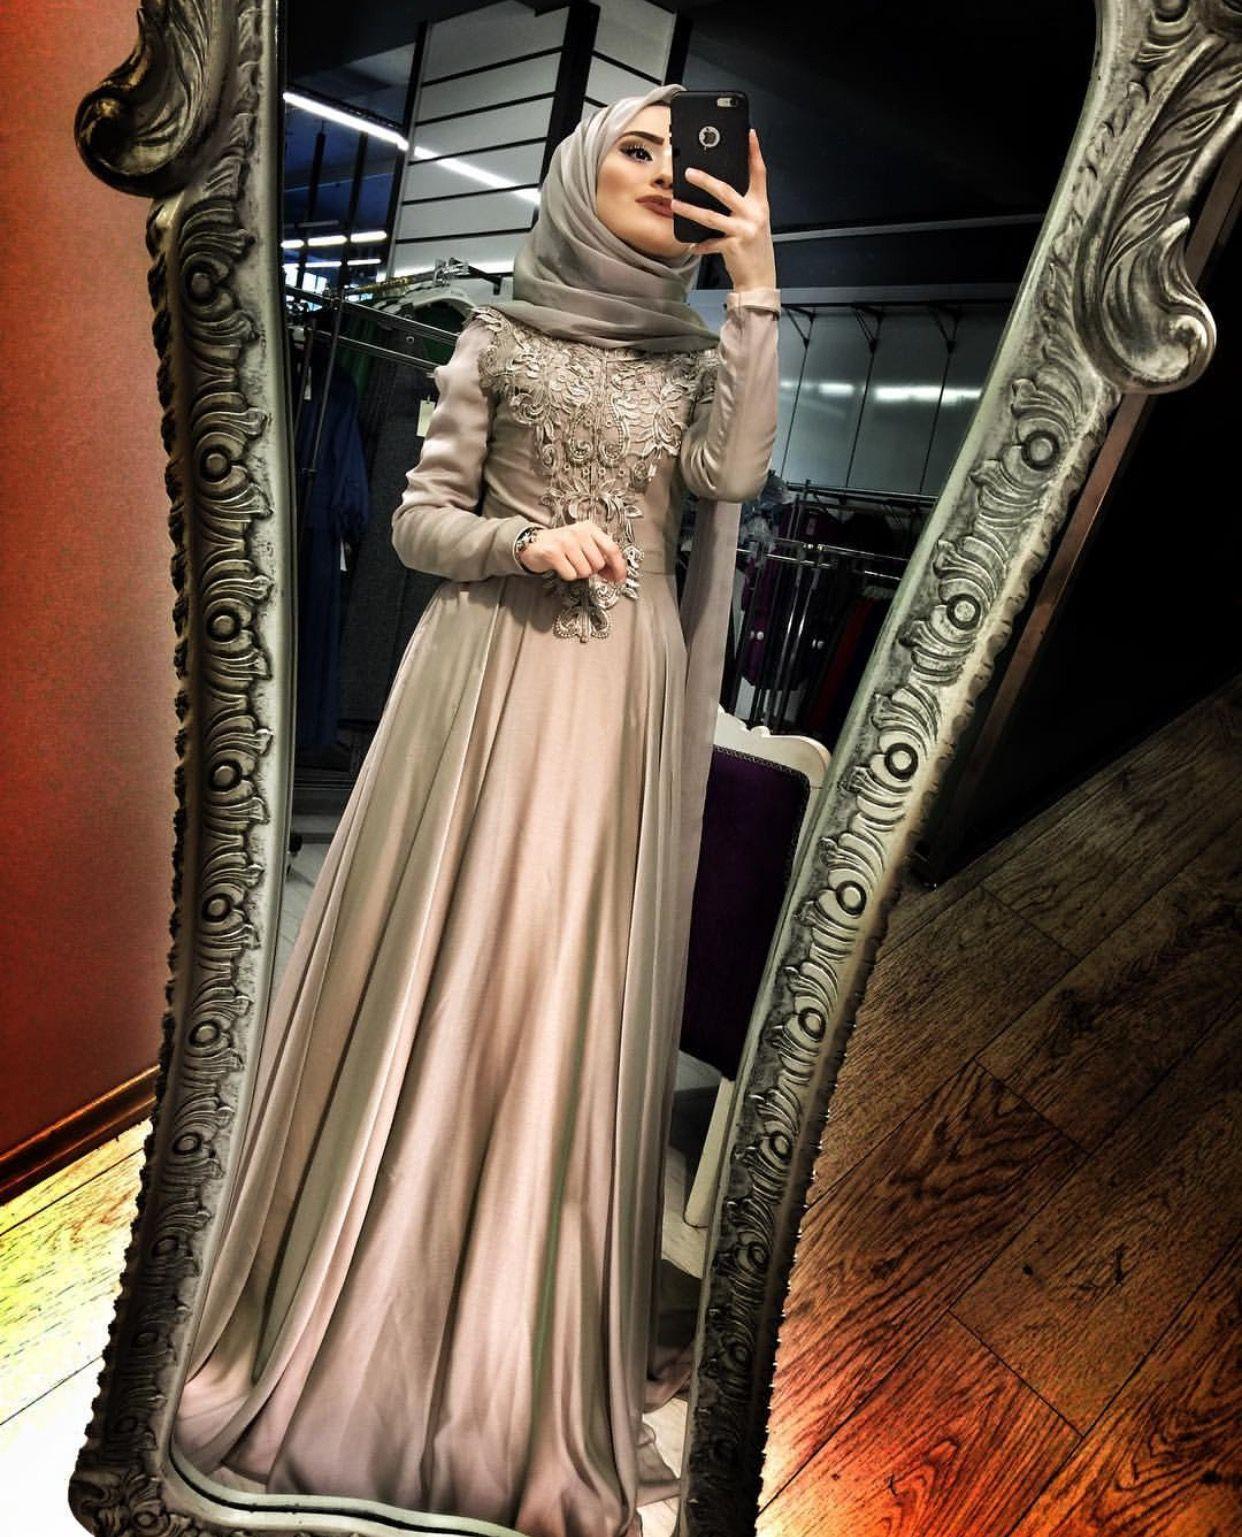 Pin by joy wrs on hijabis pinterest hijab dress muslim and prom